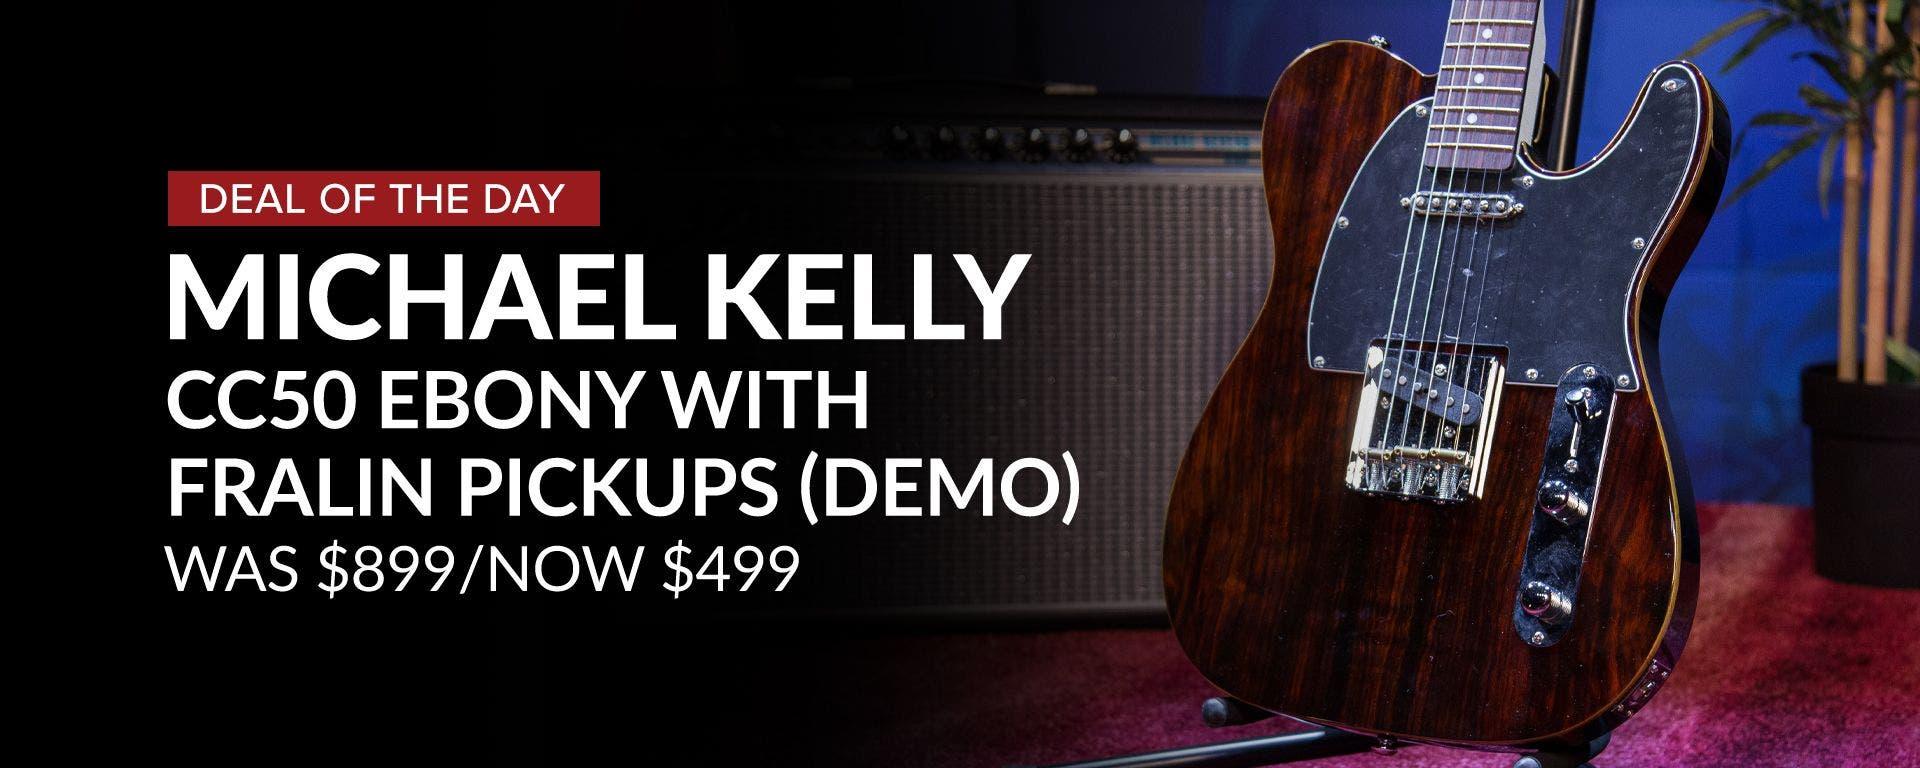 Michael Kelly CC50 Fralin Ebony Guitar